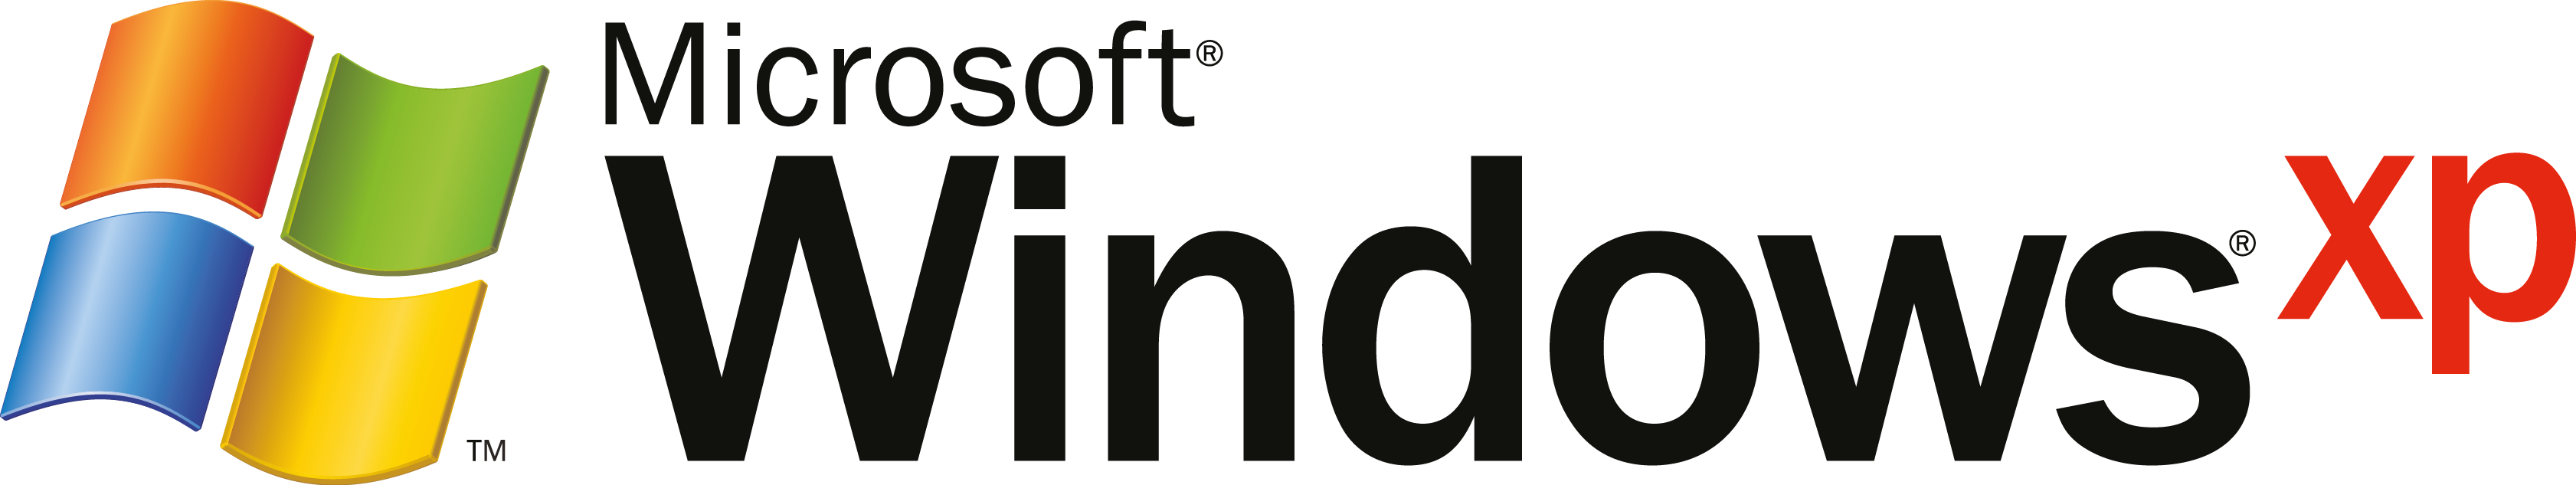 Windows logos PNG images